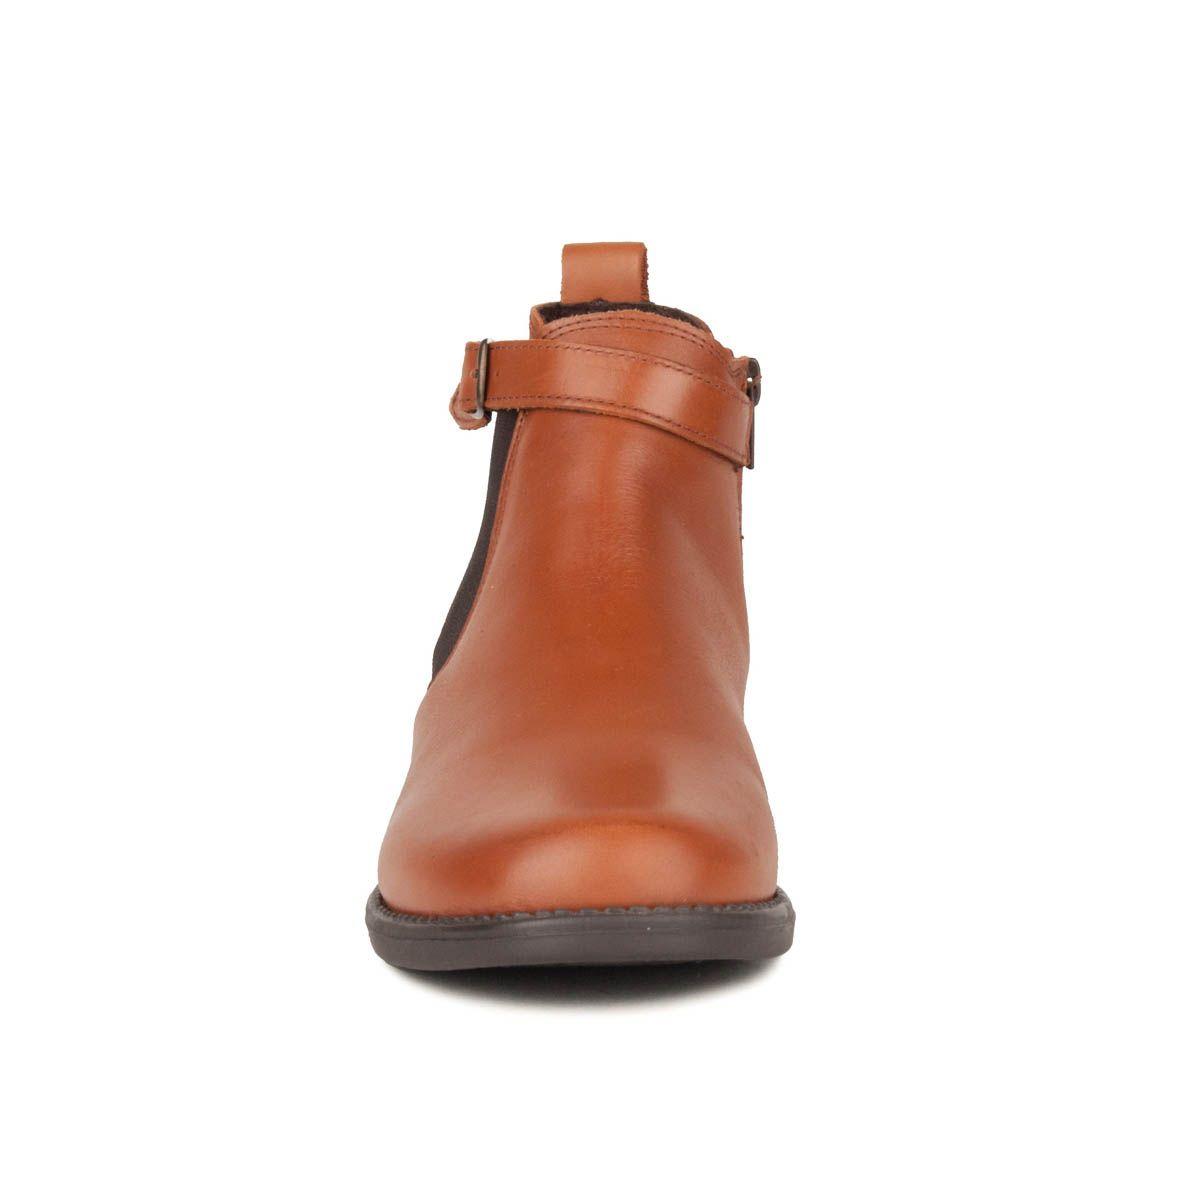 Montevita Chelsea Boot in Camel